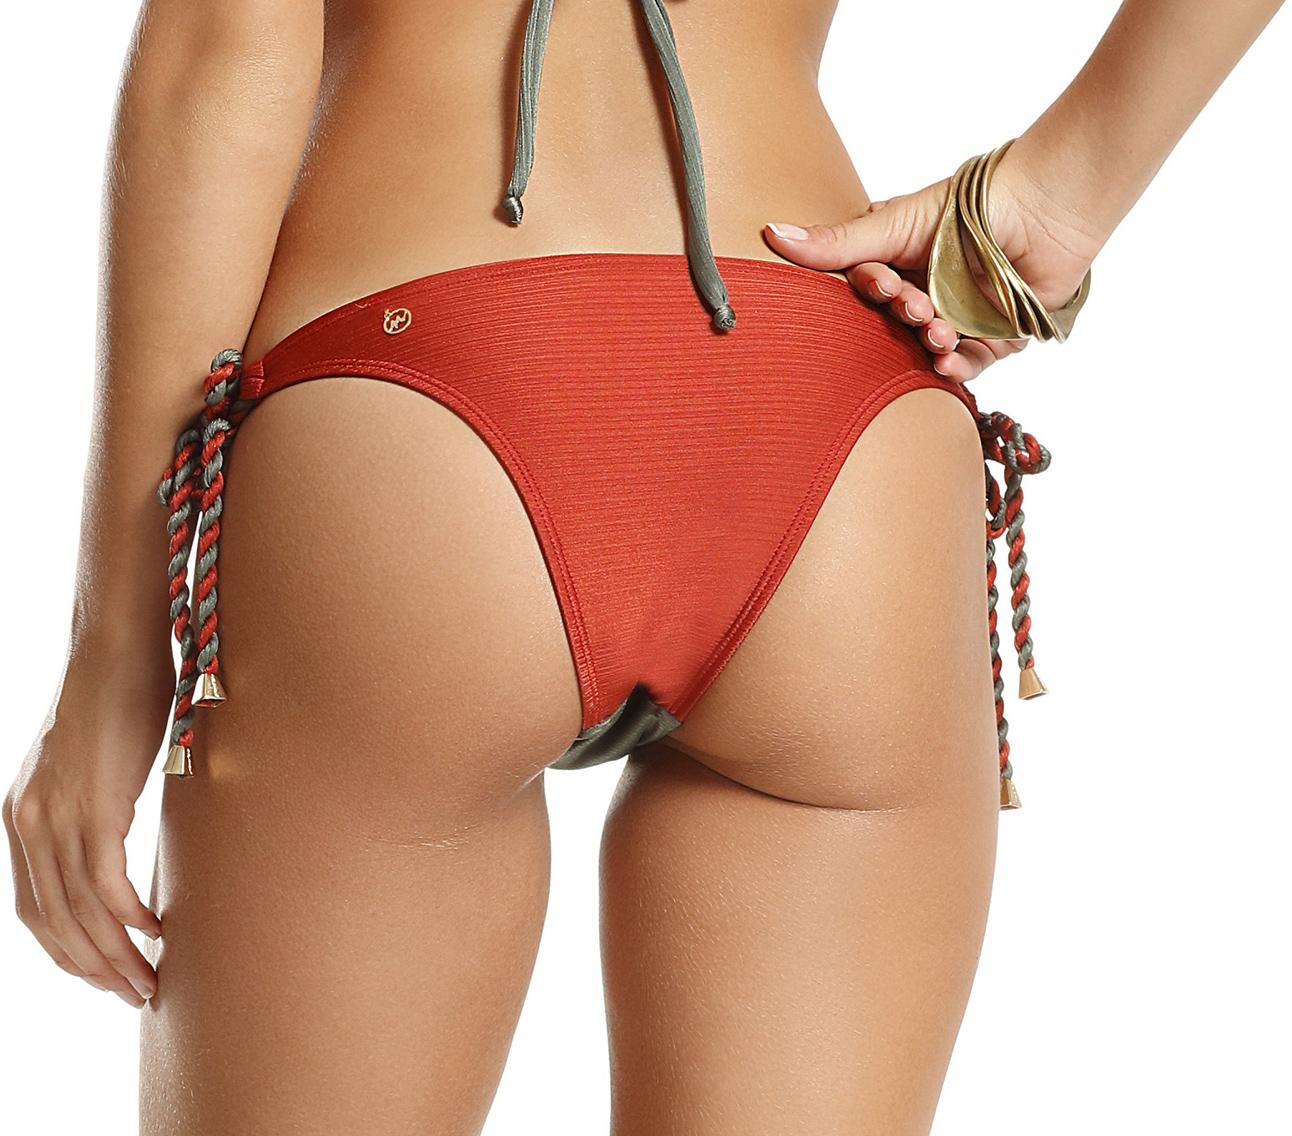 bf5847247a4f9 Brazilian Bikini Bottom - Grey And Dark Orange - Bottom Power Lisos